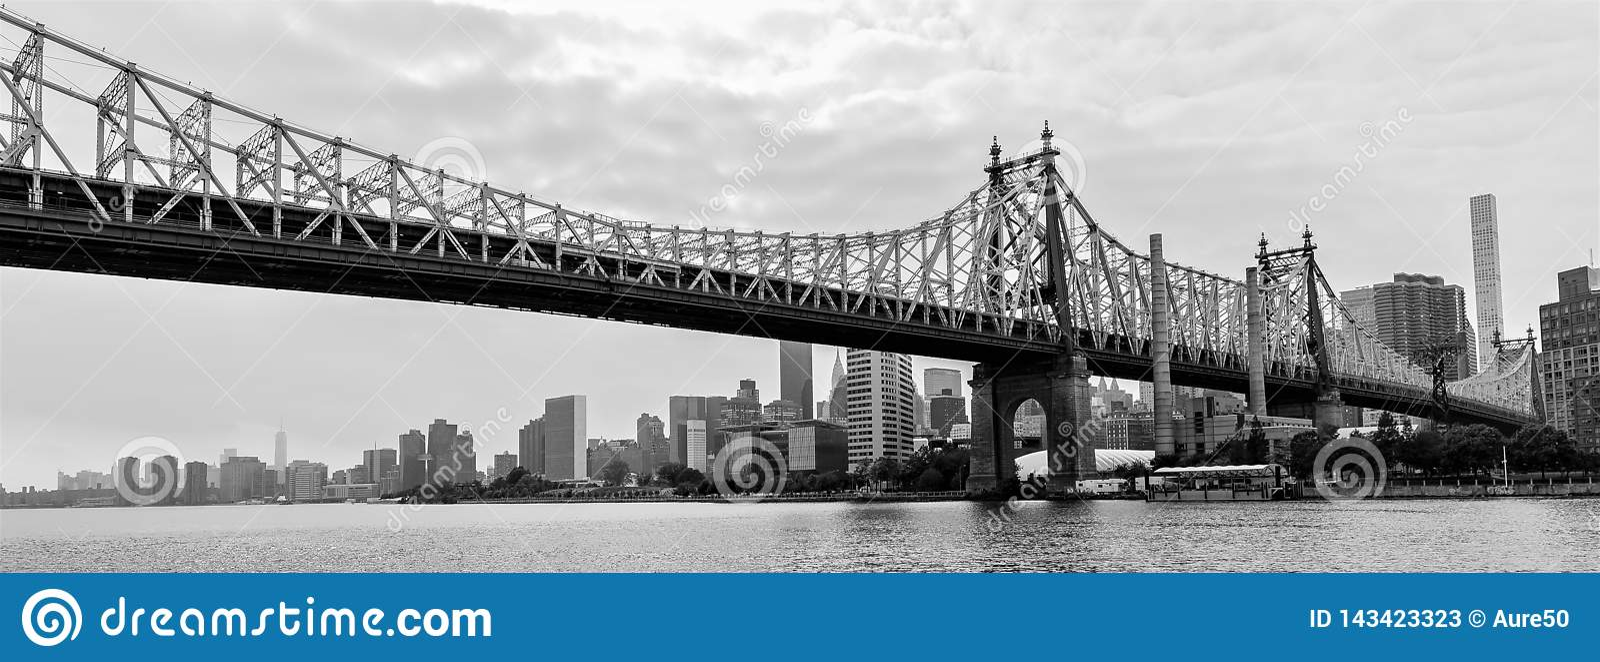 Ed Koch Queensboro Bridge from the Queens, New York City, USA